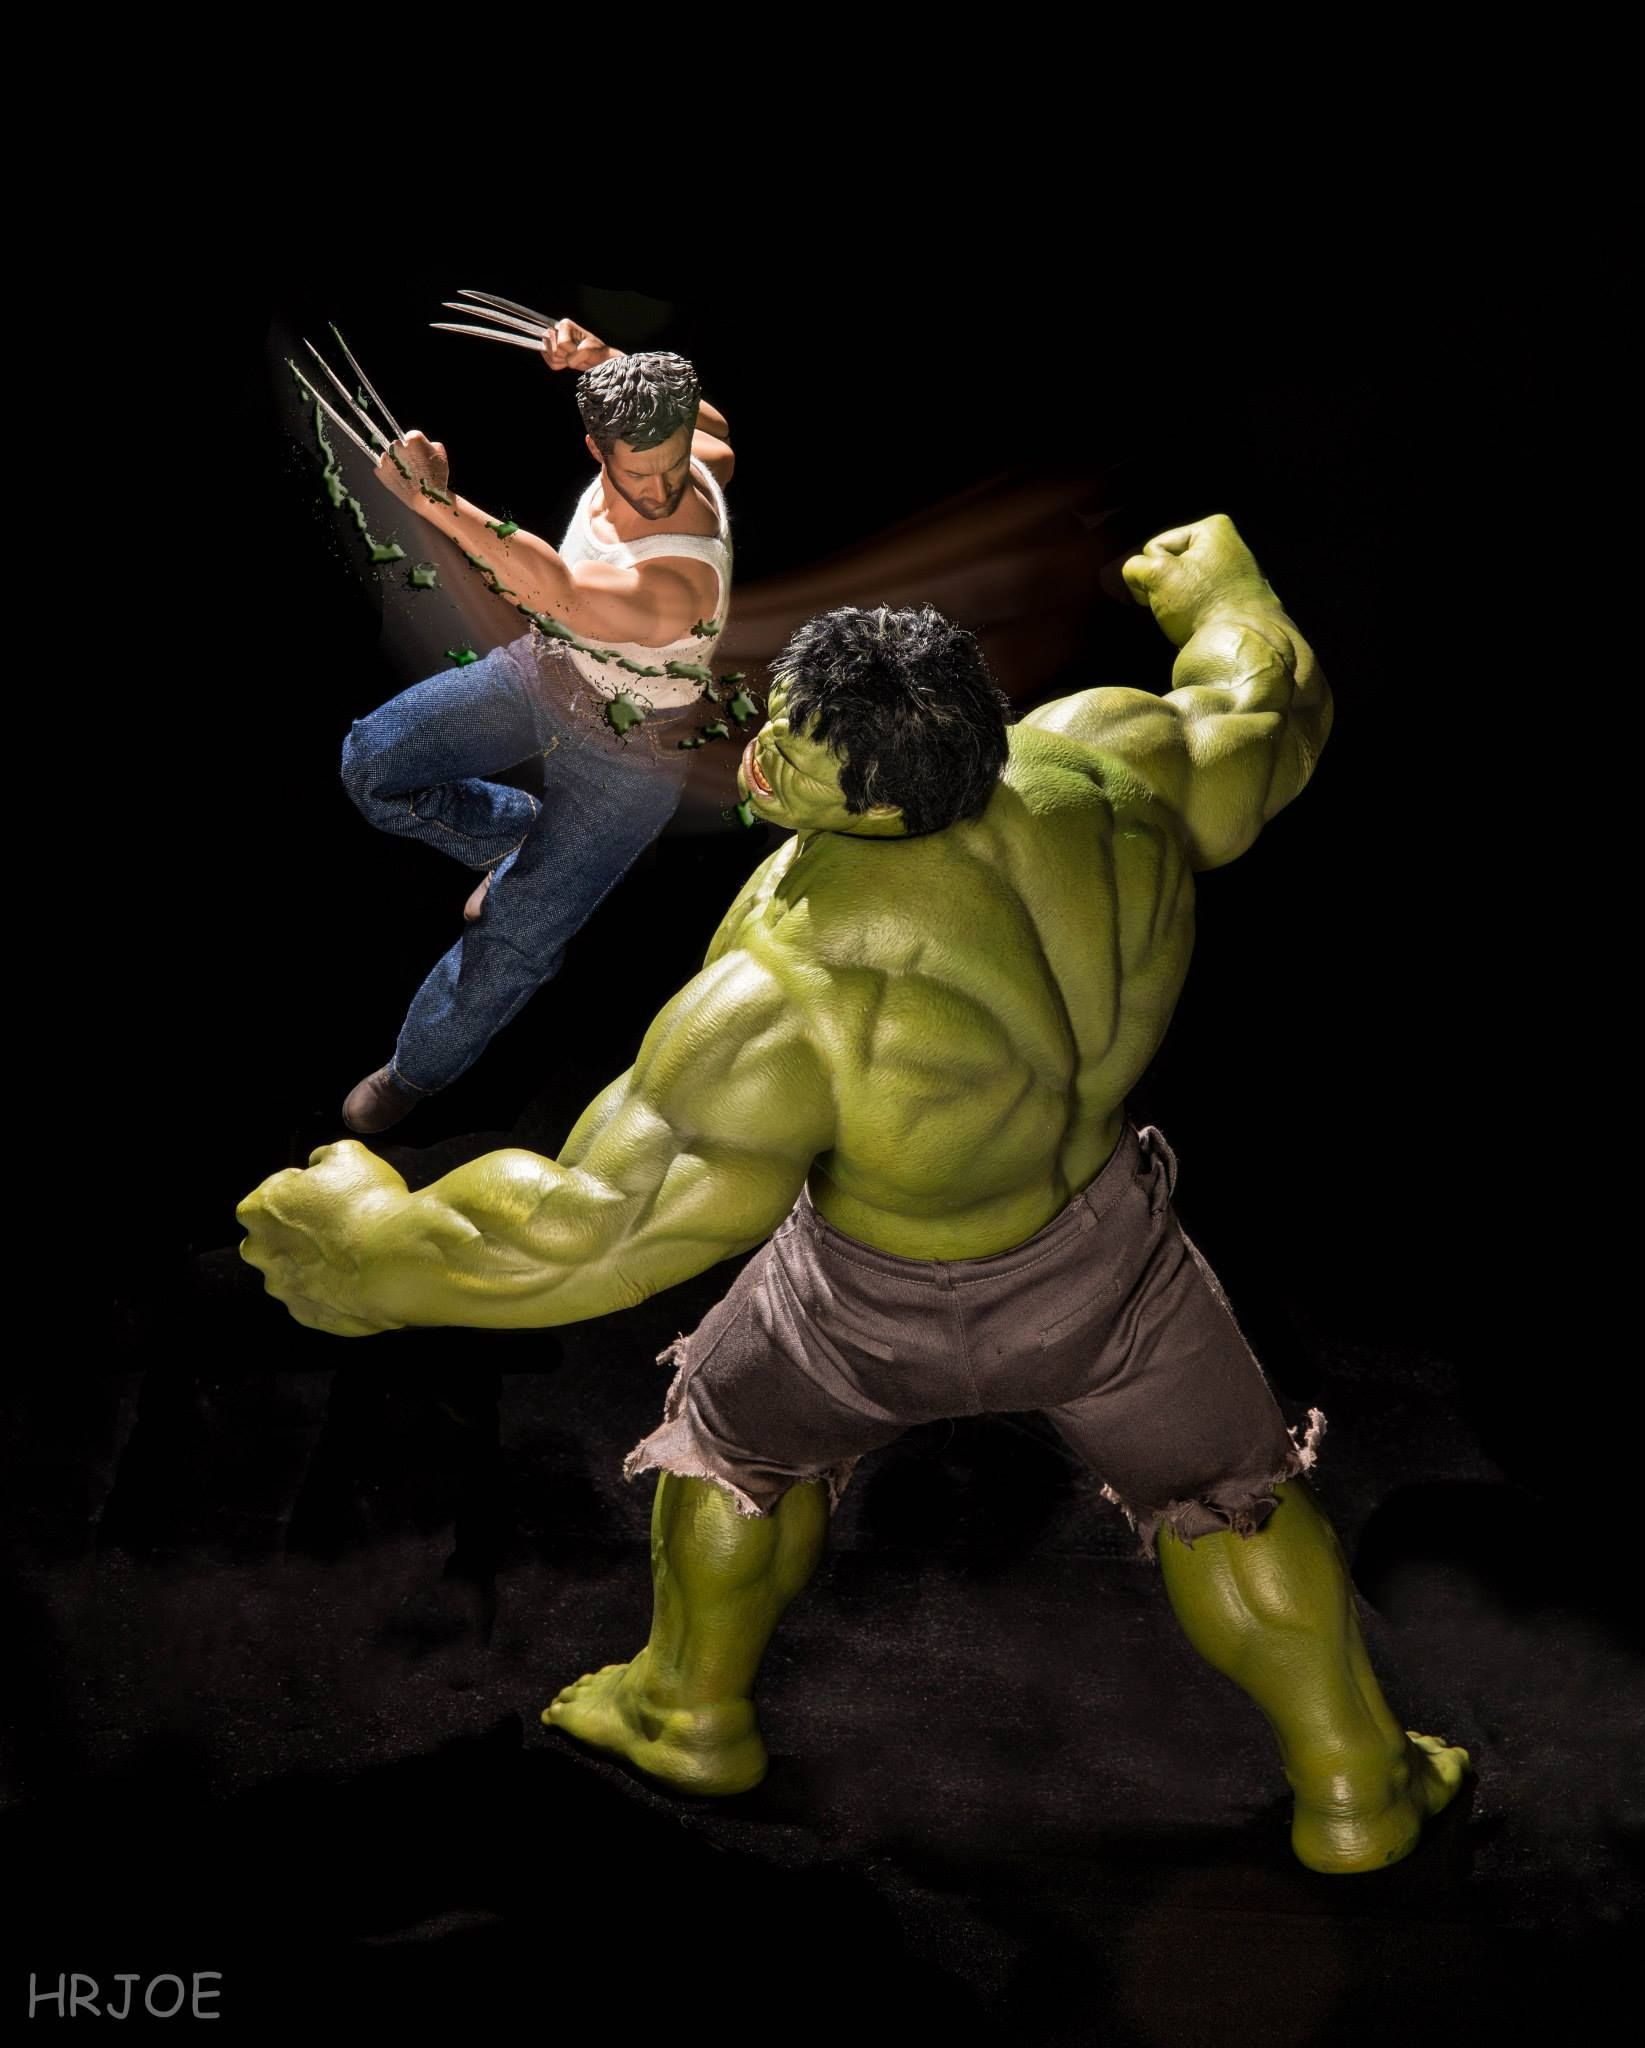 #Hulk #Fan #Art. (The Secret Life Of Superhero Toys) By Edy Hardjo aka HrJoe. ÅWESOMENESS!!!™ ÅÅÅ+